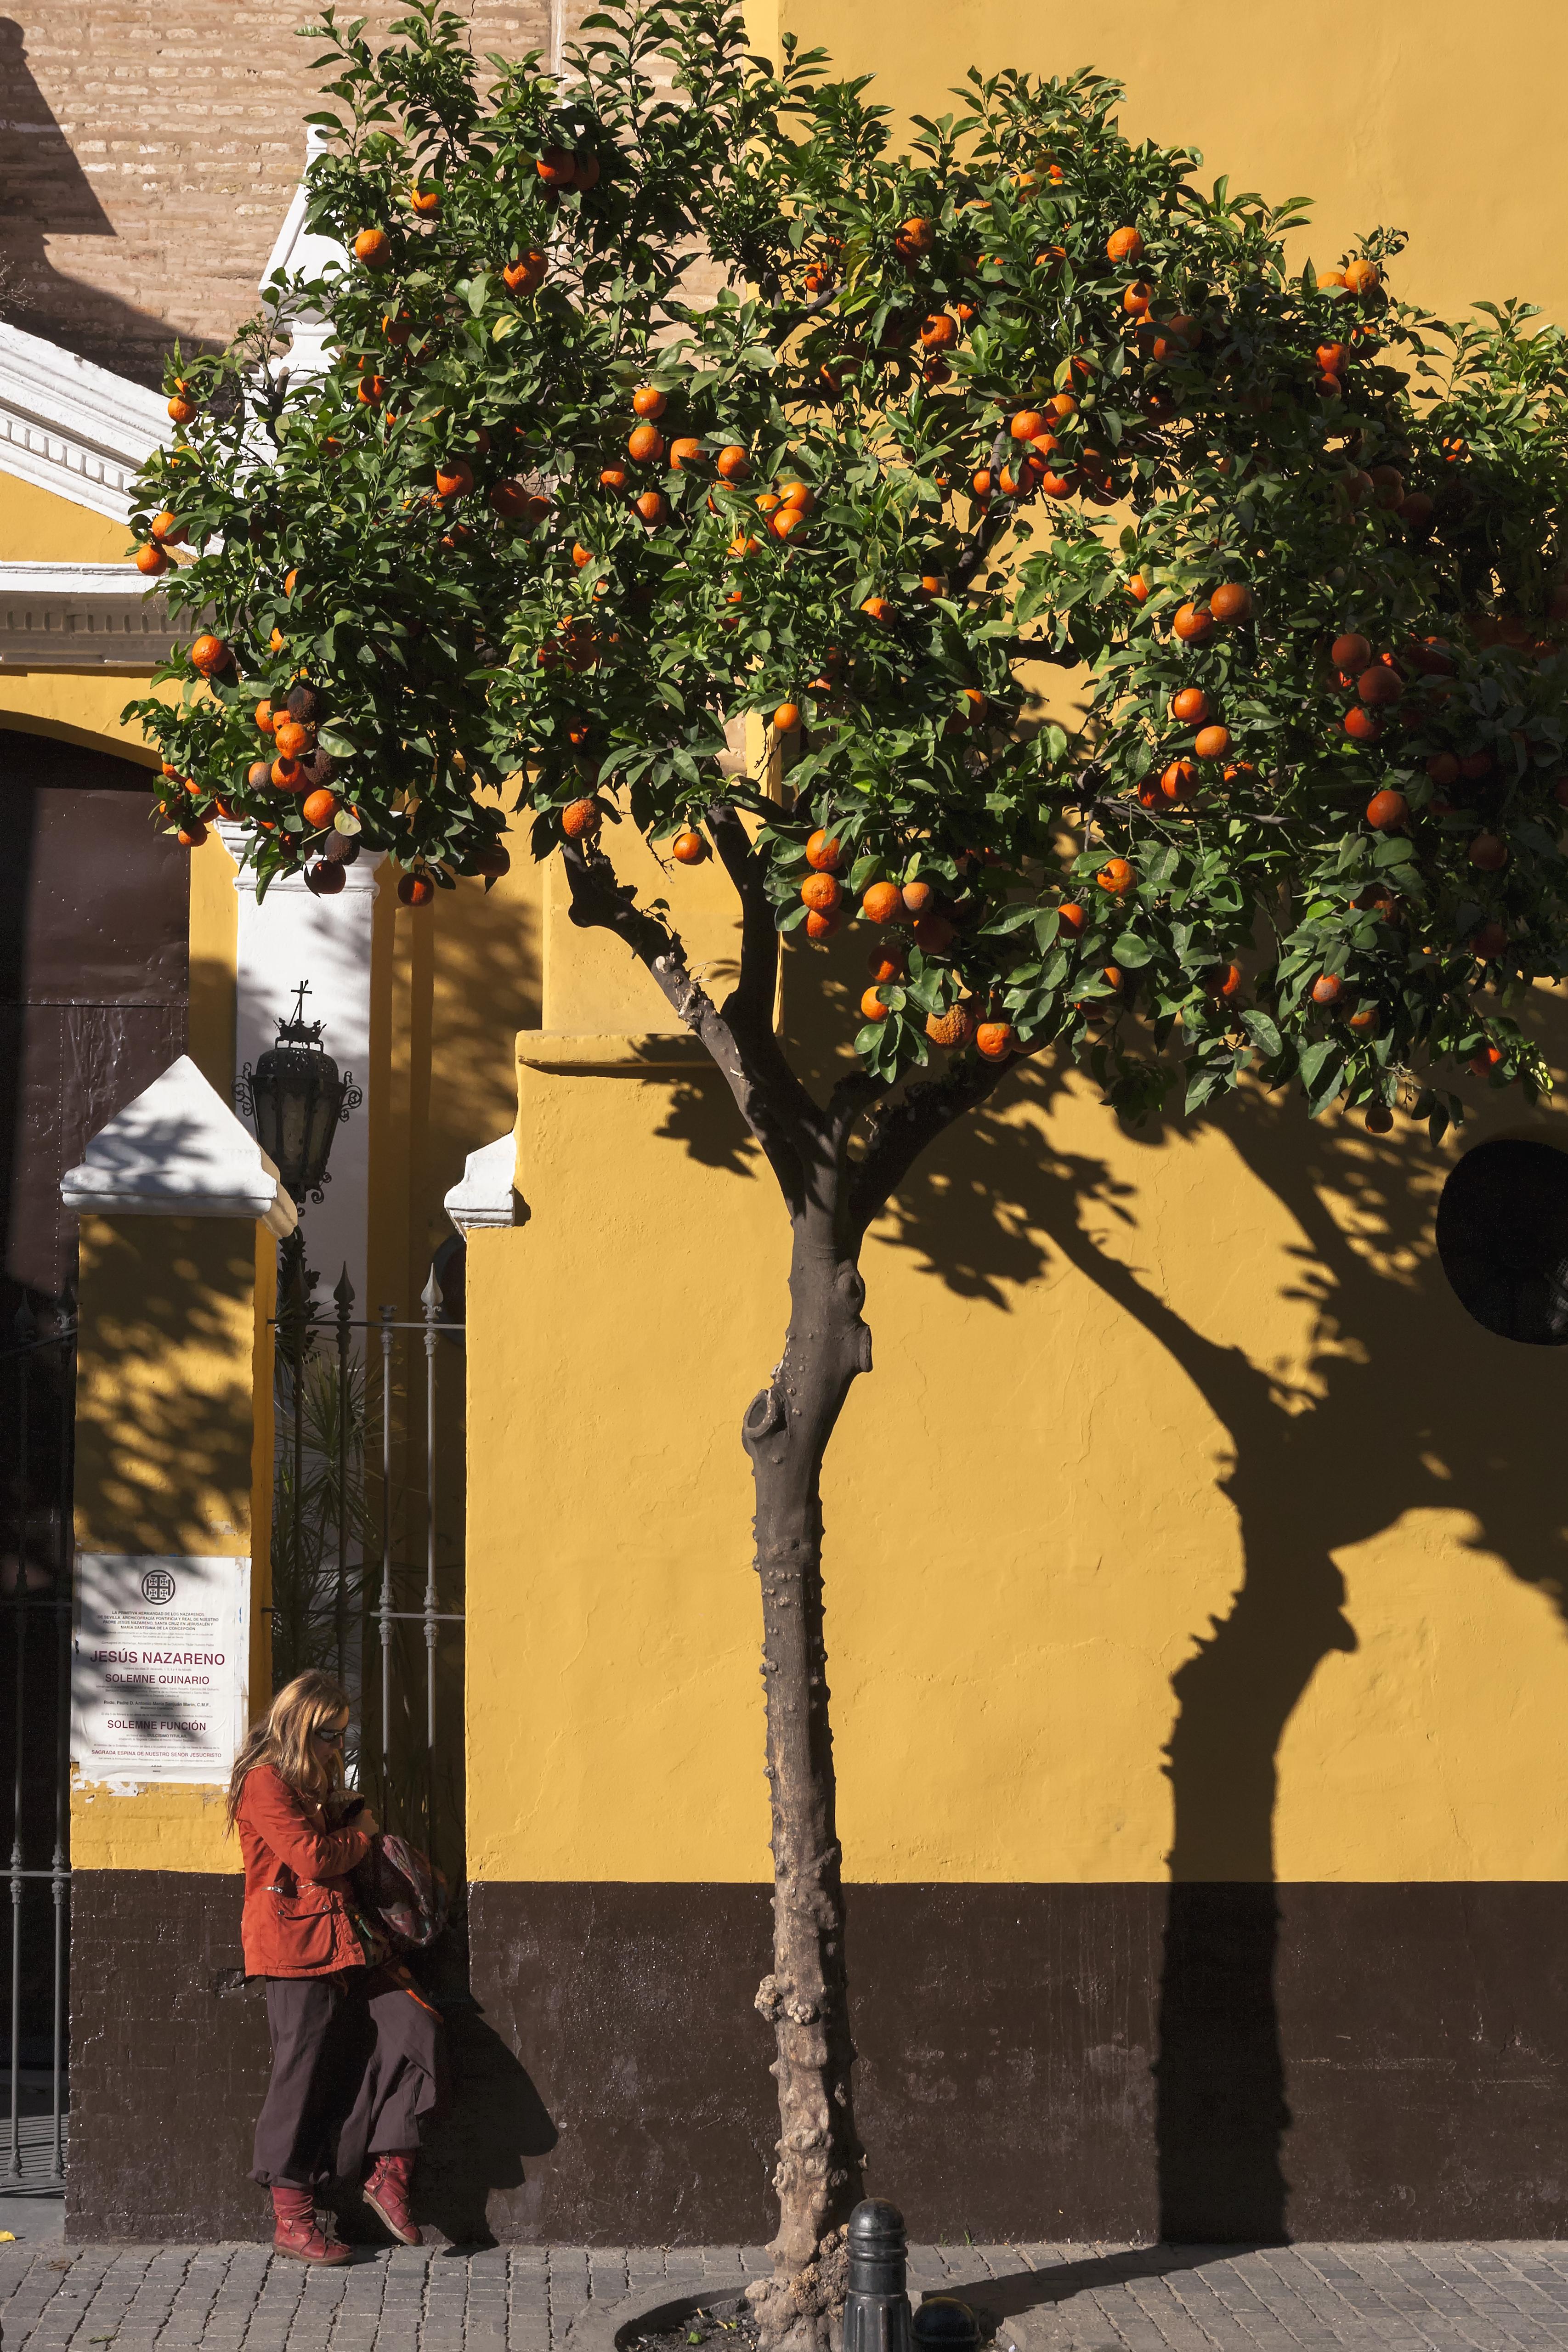 C14 Plaza de San Martin, Sevilla